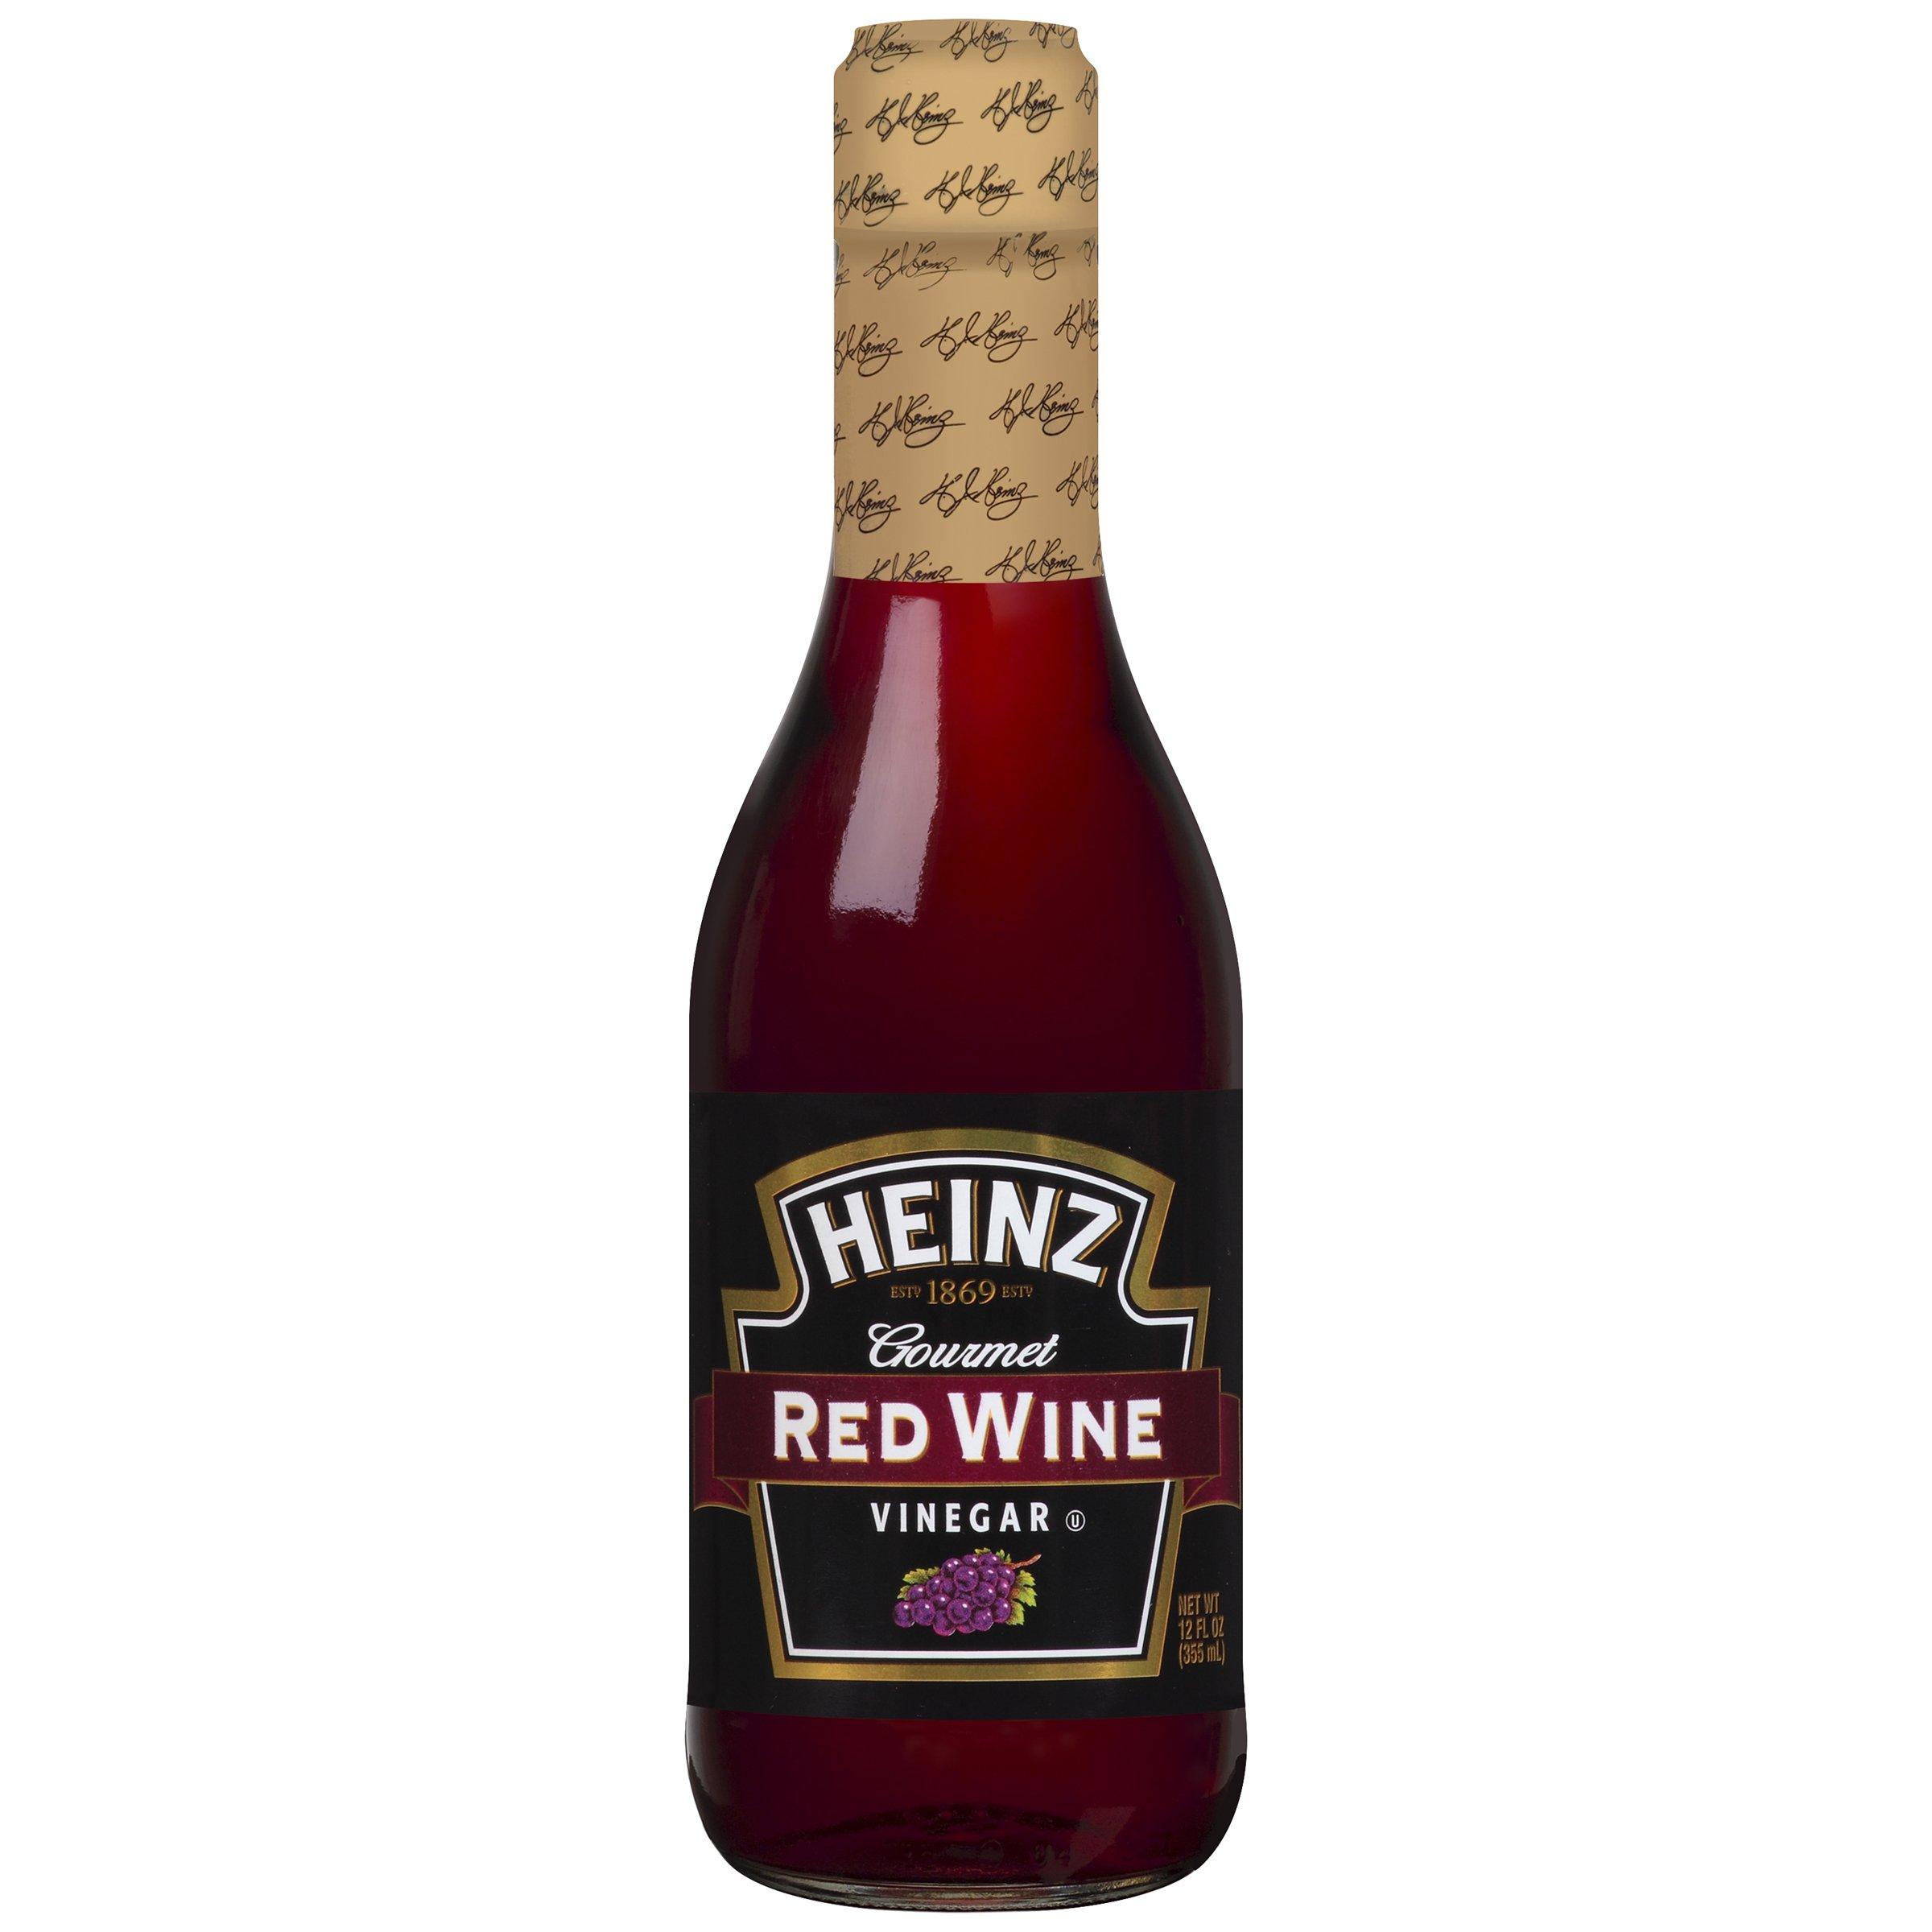 Heinz Red Wine Vinegar (12 oz Bottles, Pack of 12) by Heinz